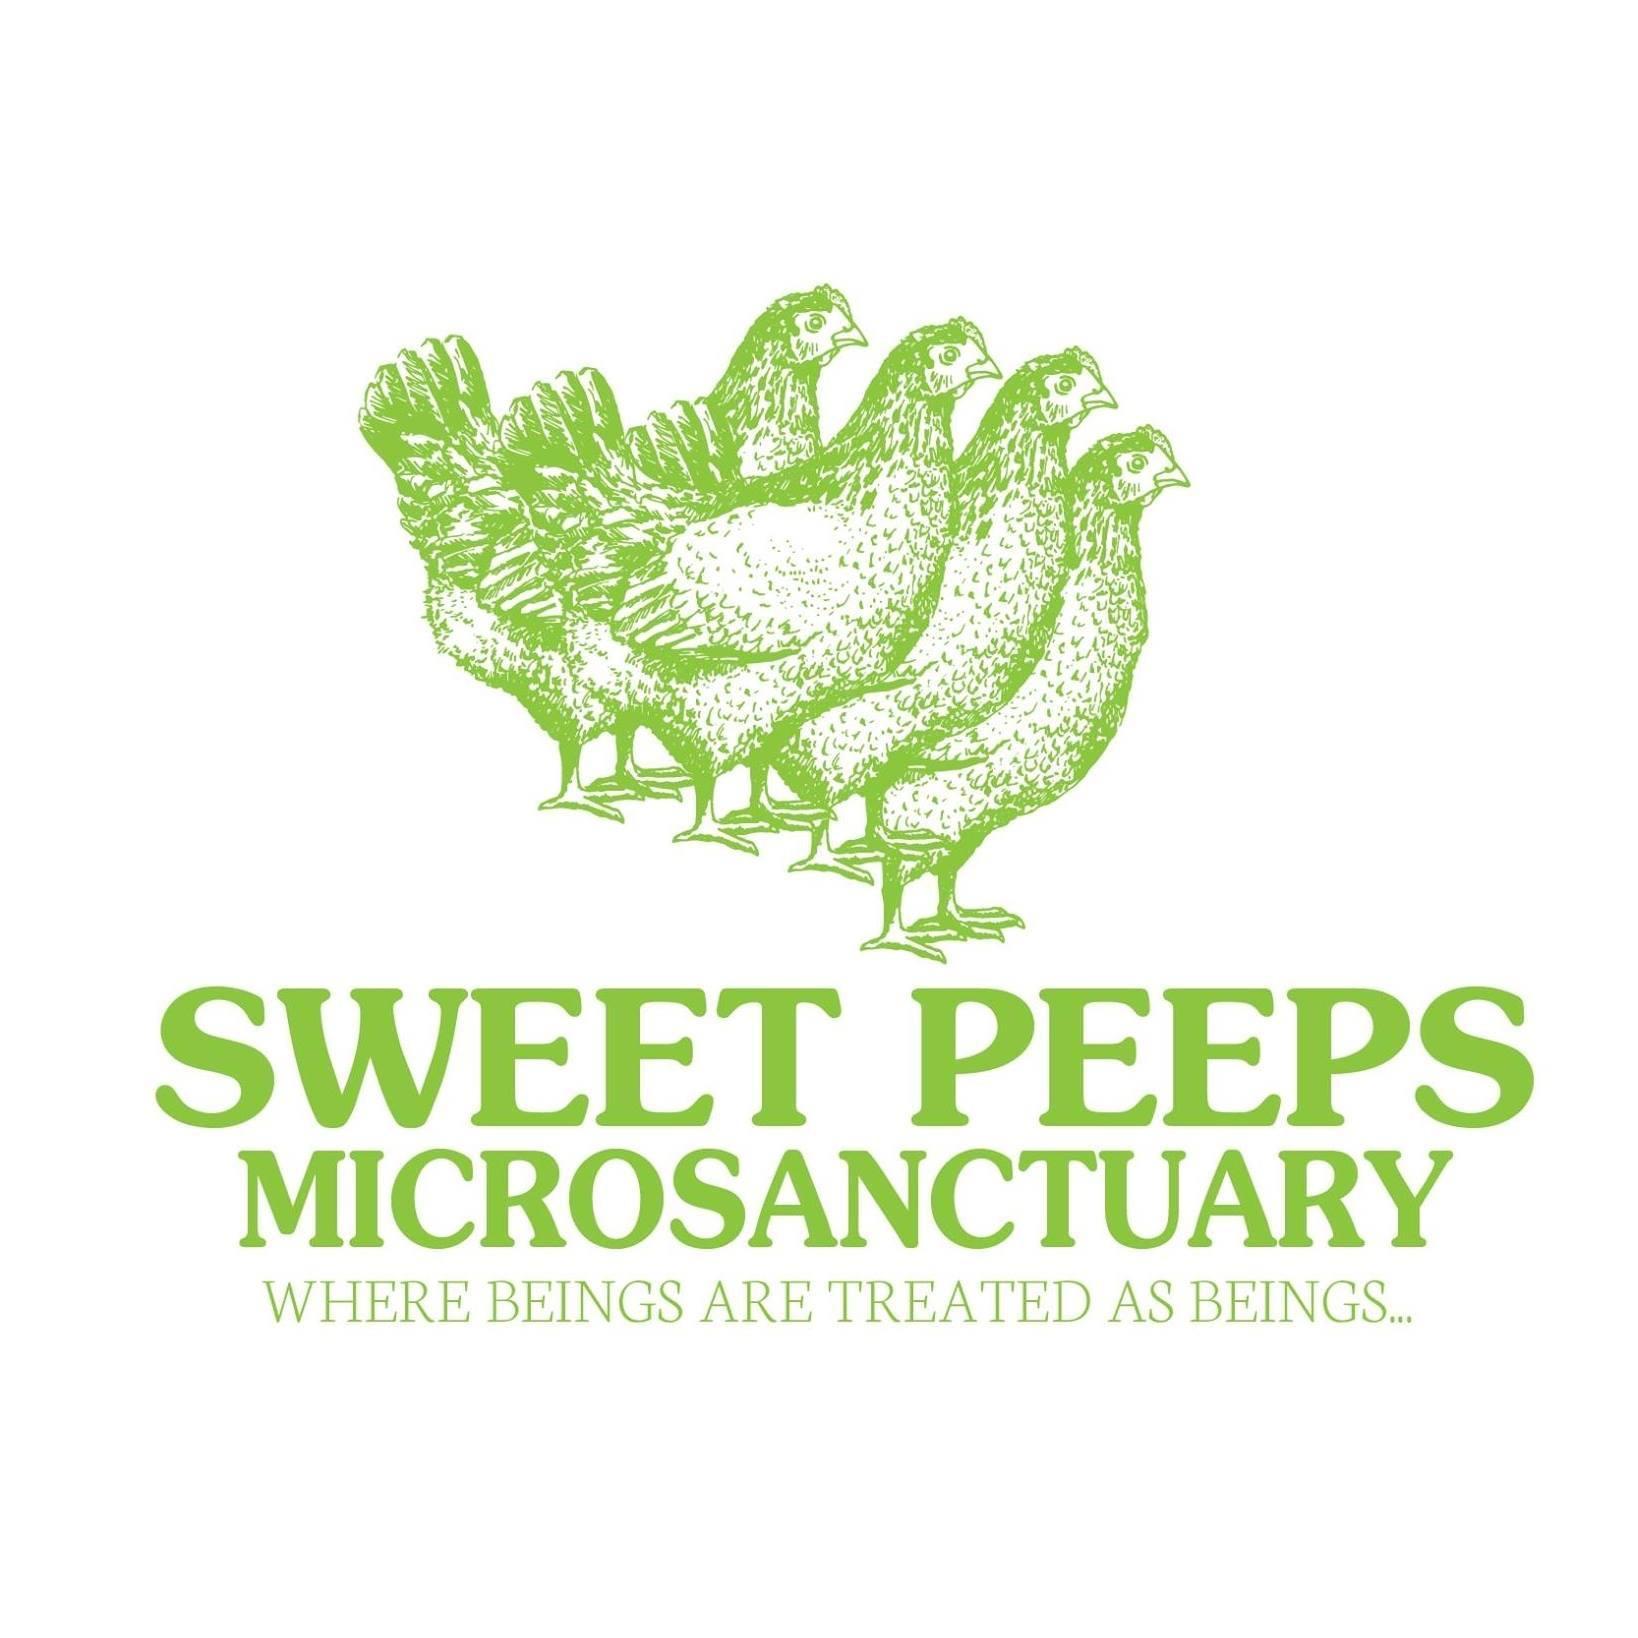 Sweet Peeps Microsanctuary